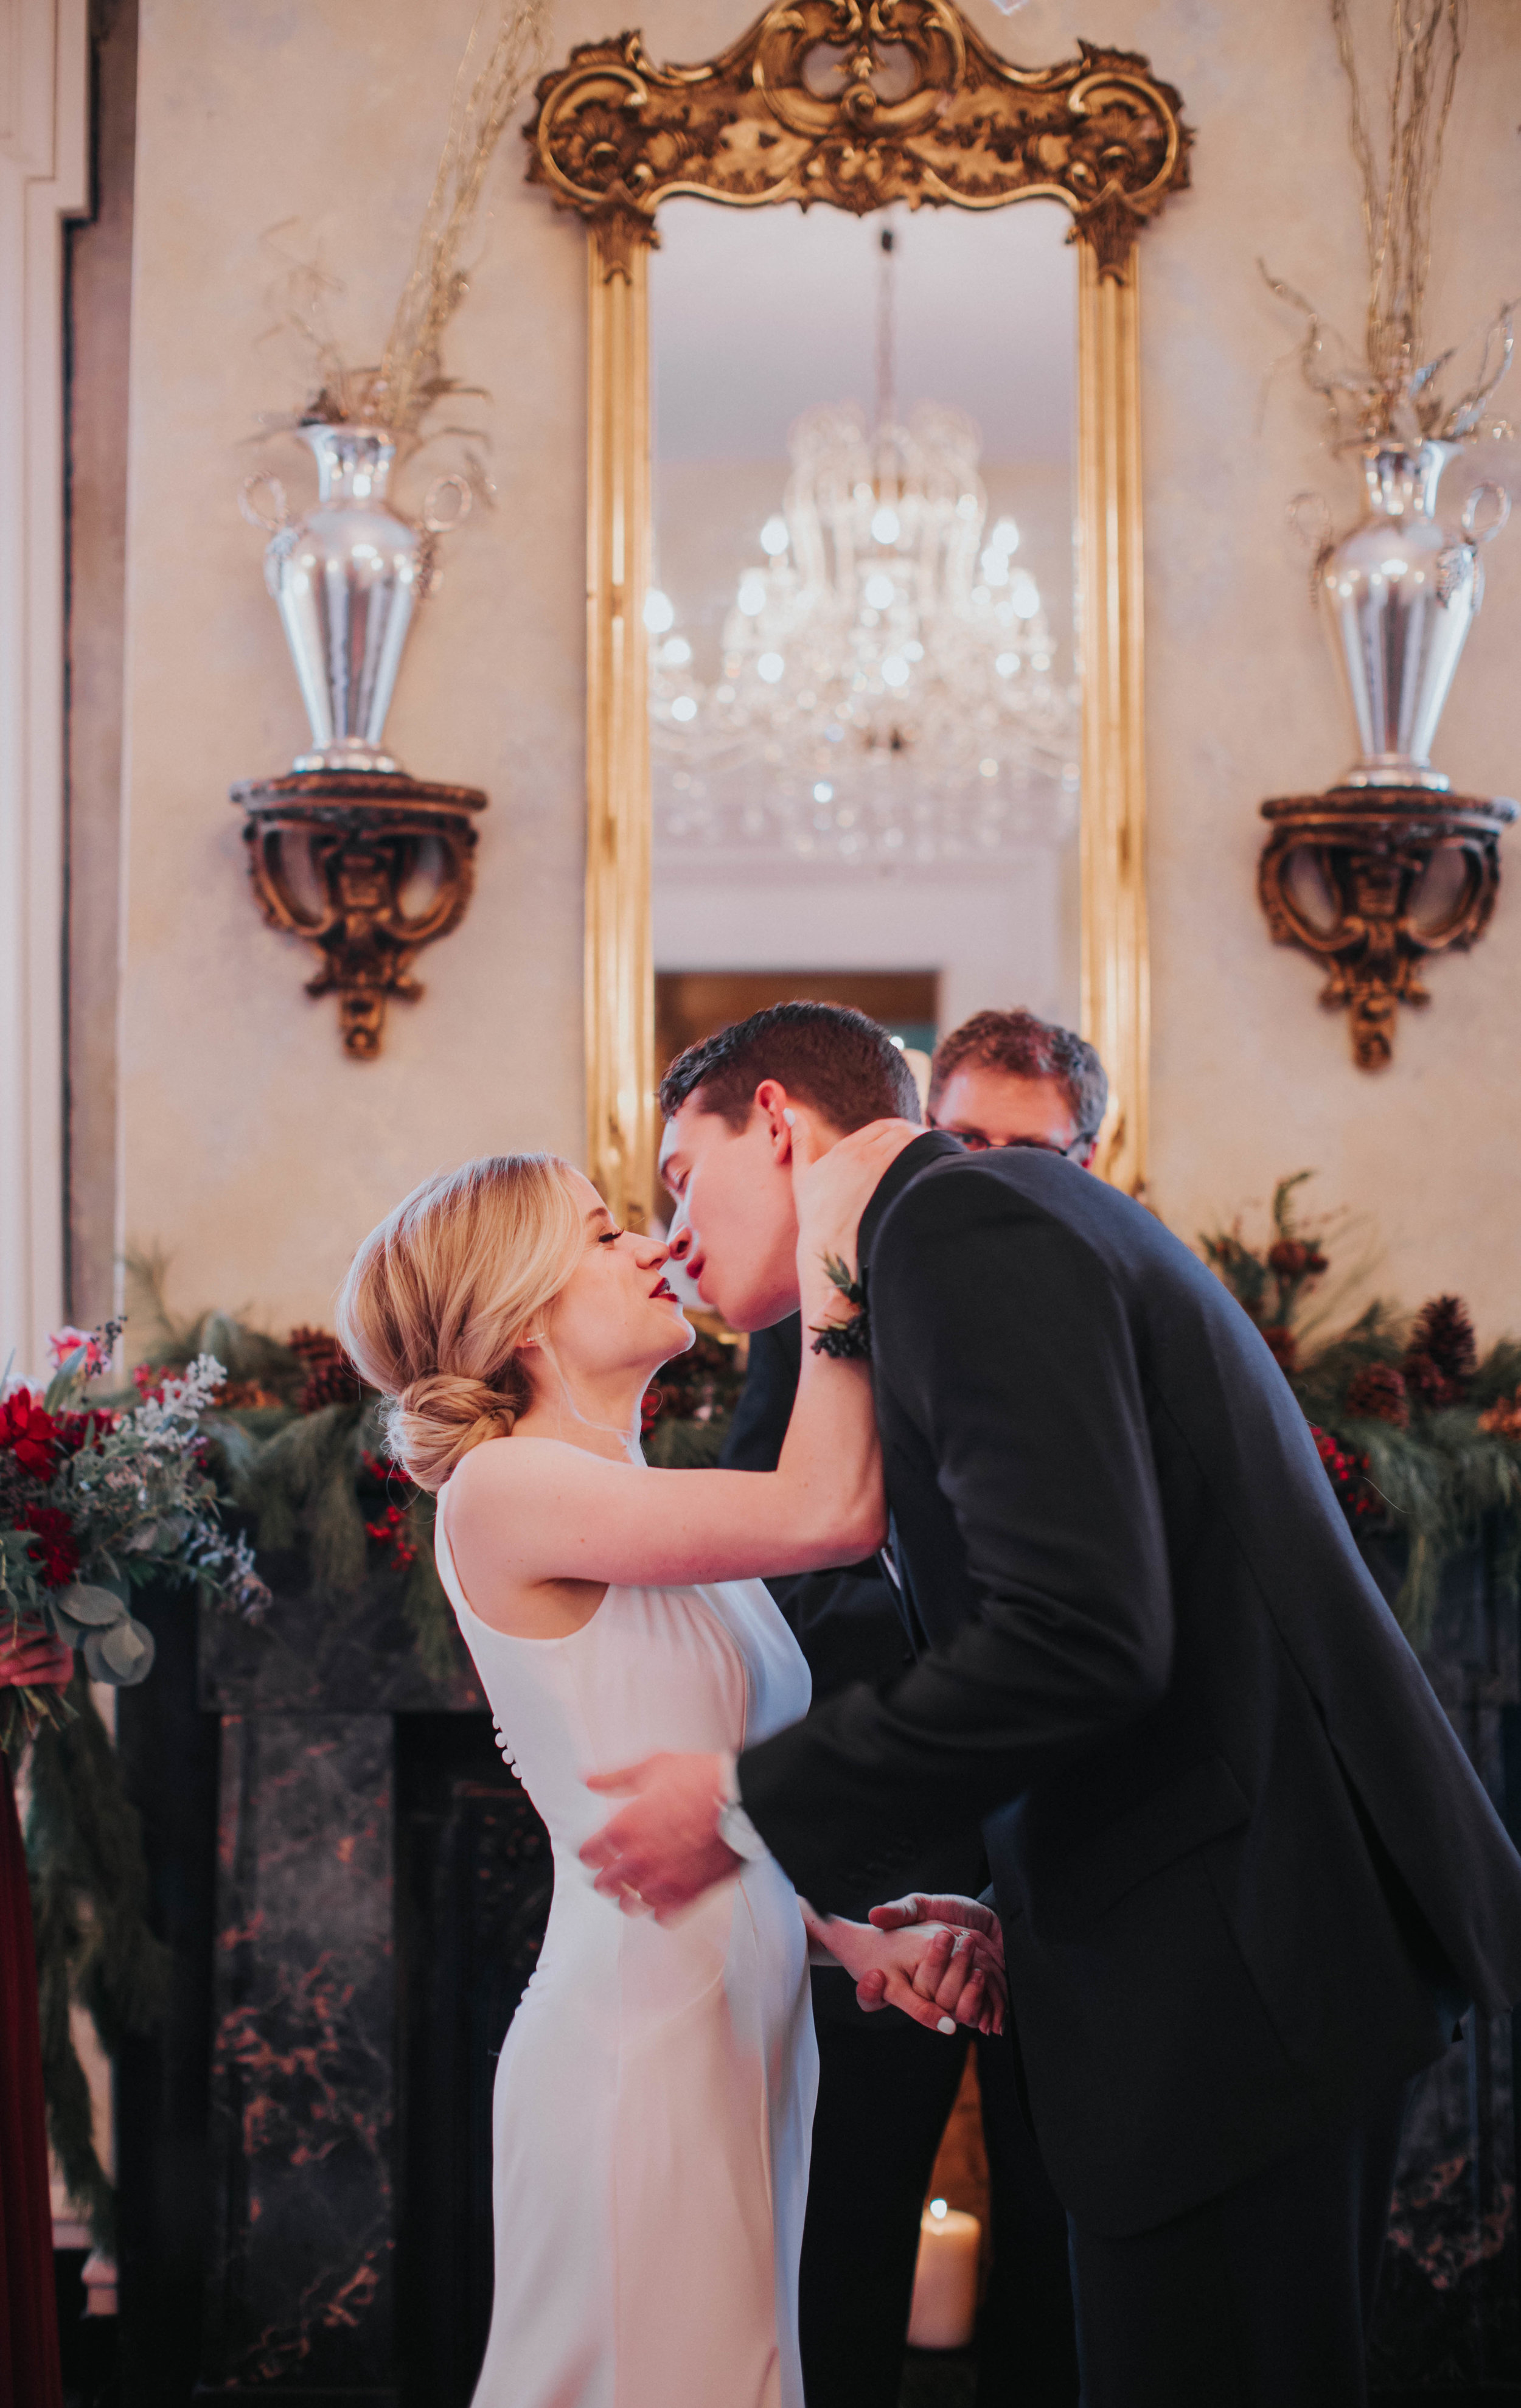 Charis_Lauren_Romantic_Wedding_Photographer_Nashville_03A1466.jpg